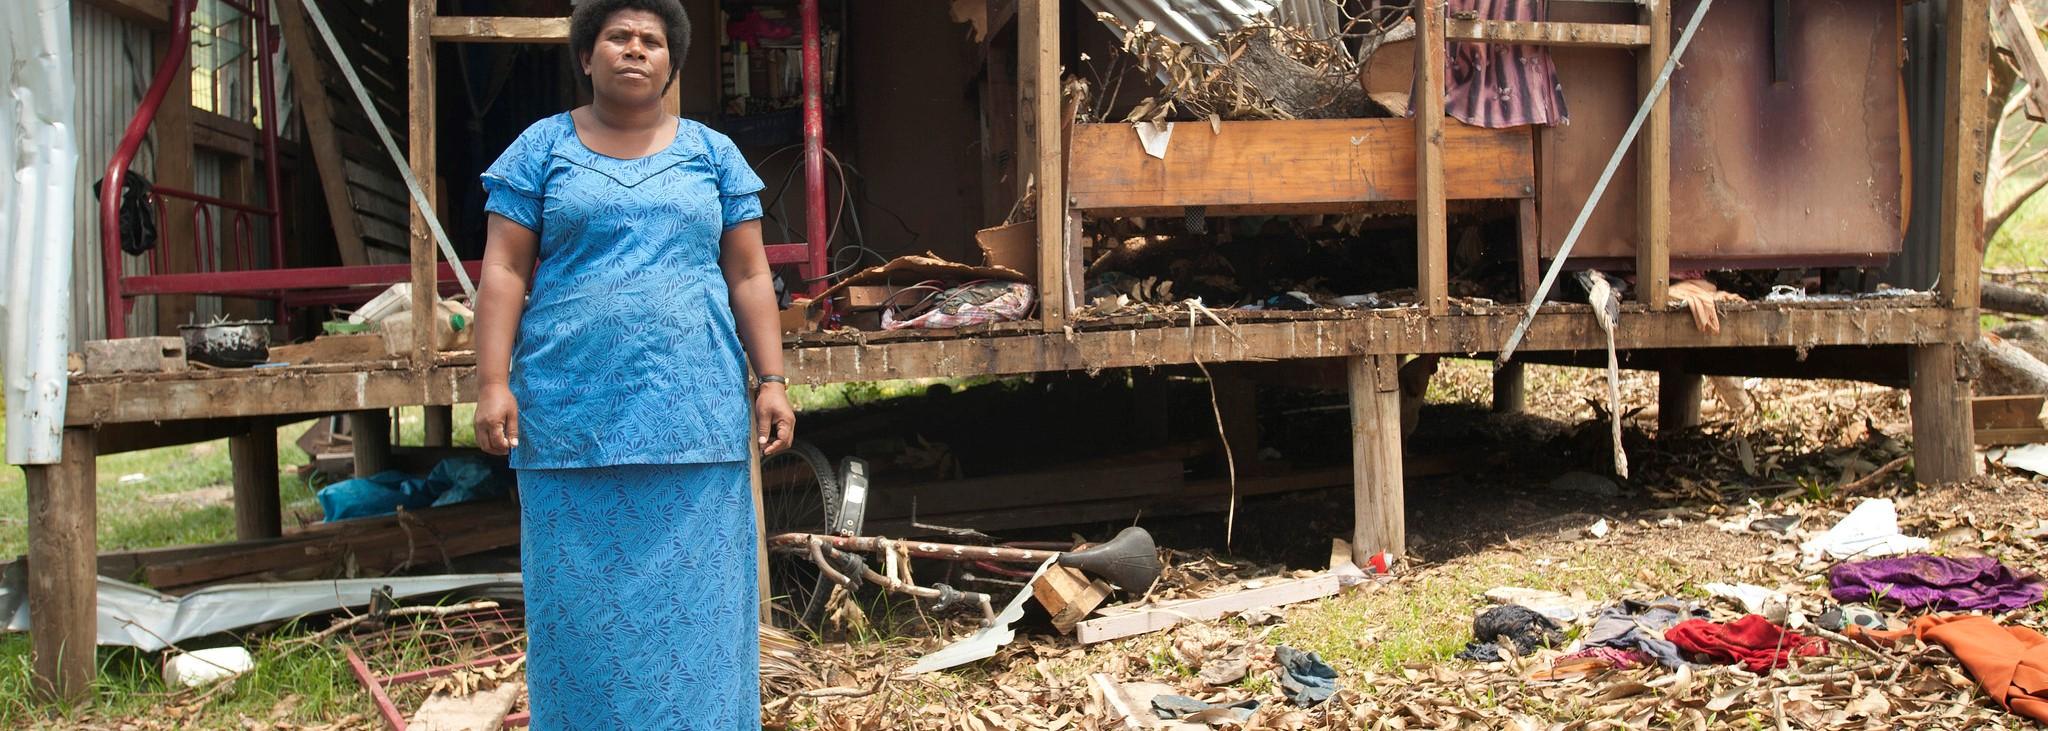 Fijian woman Salote Tubuna after Cyclone Winston hit last year in Buka Settlement, Rakiraki. (Photo: Flickr/UN Women)